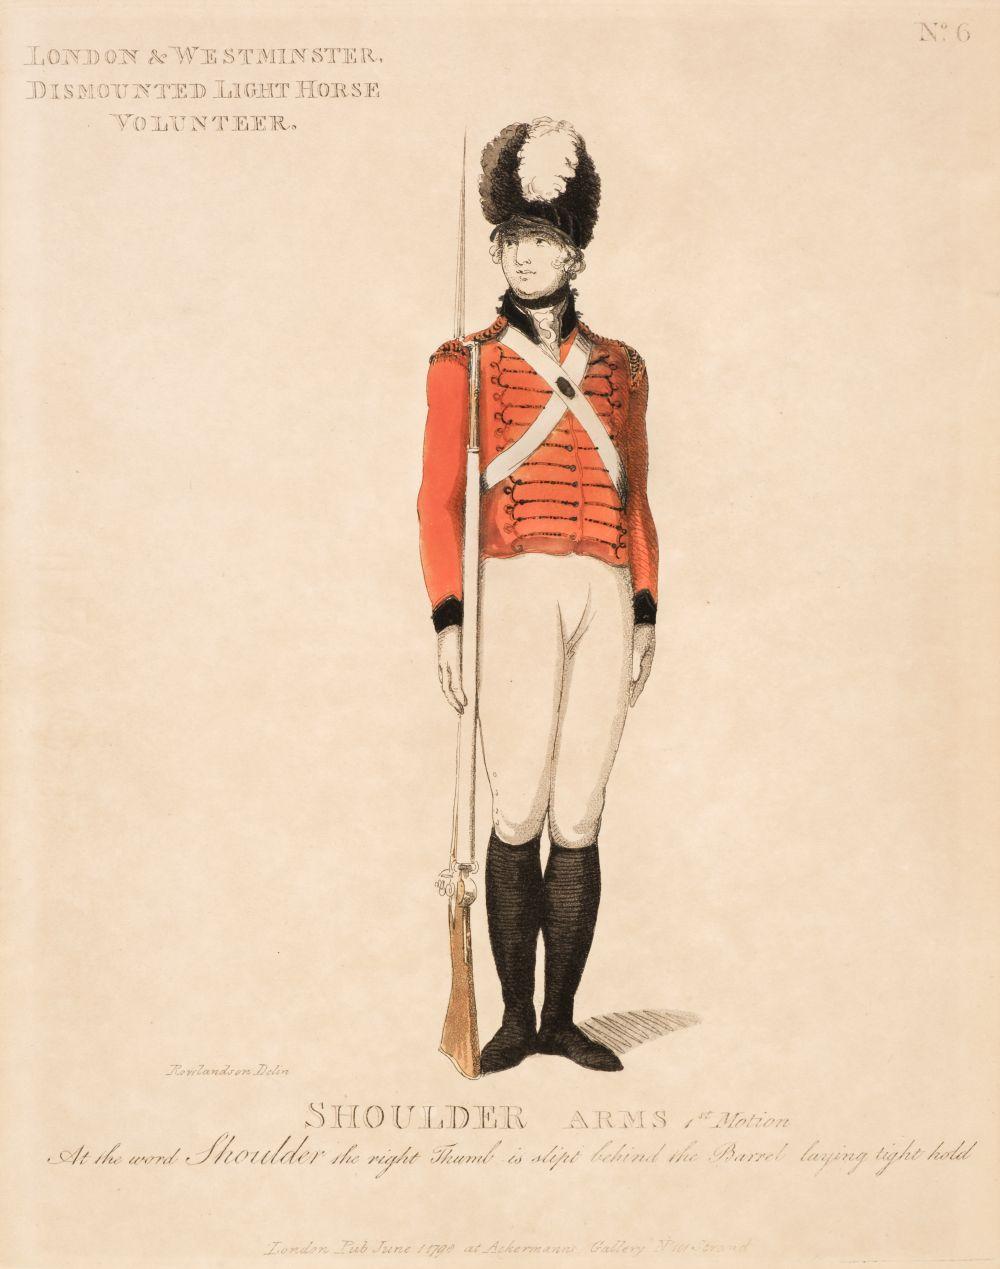 * Madeley (George E., 1798-1858). 42nd Royal Highlanders & 77nd Highlanders, circa 1840